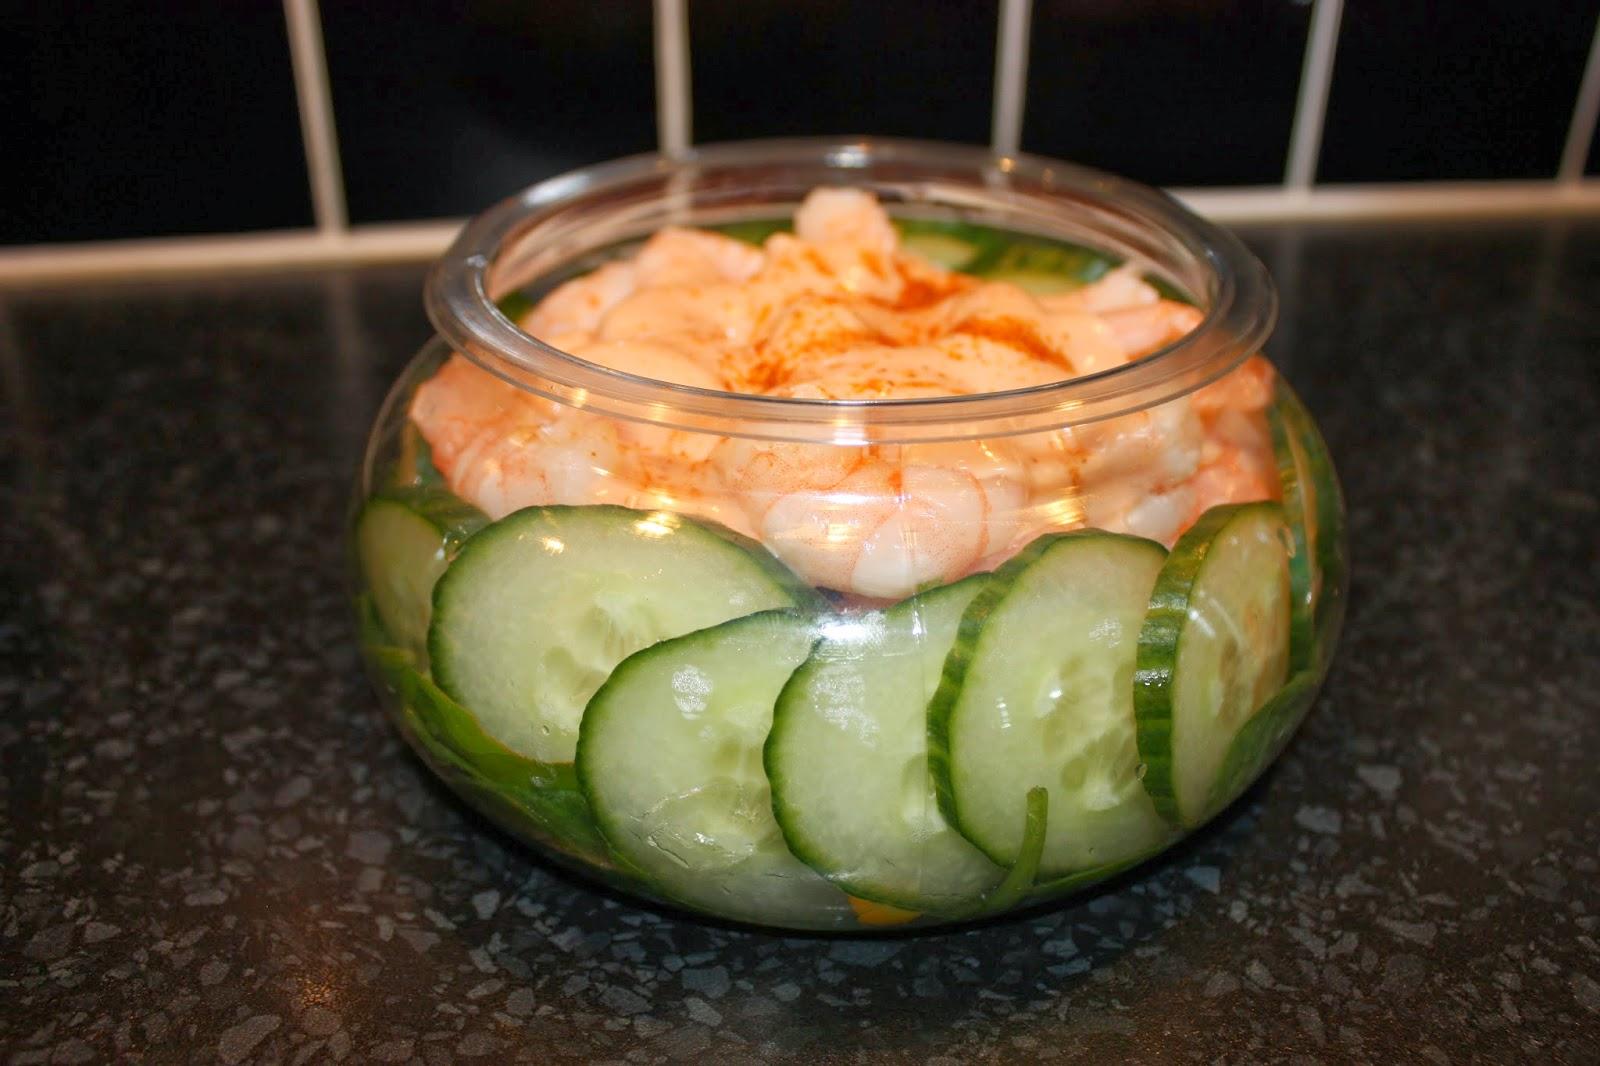 A Cauldron pot showing a layered prawn salad